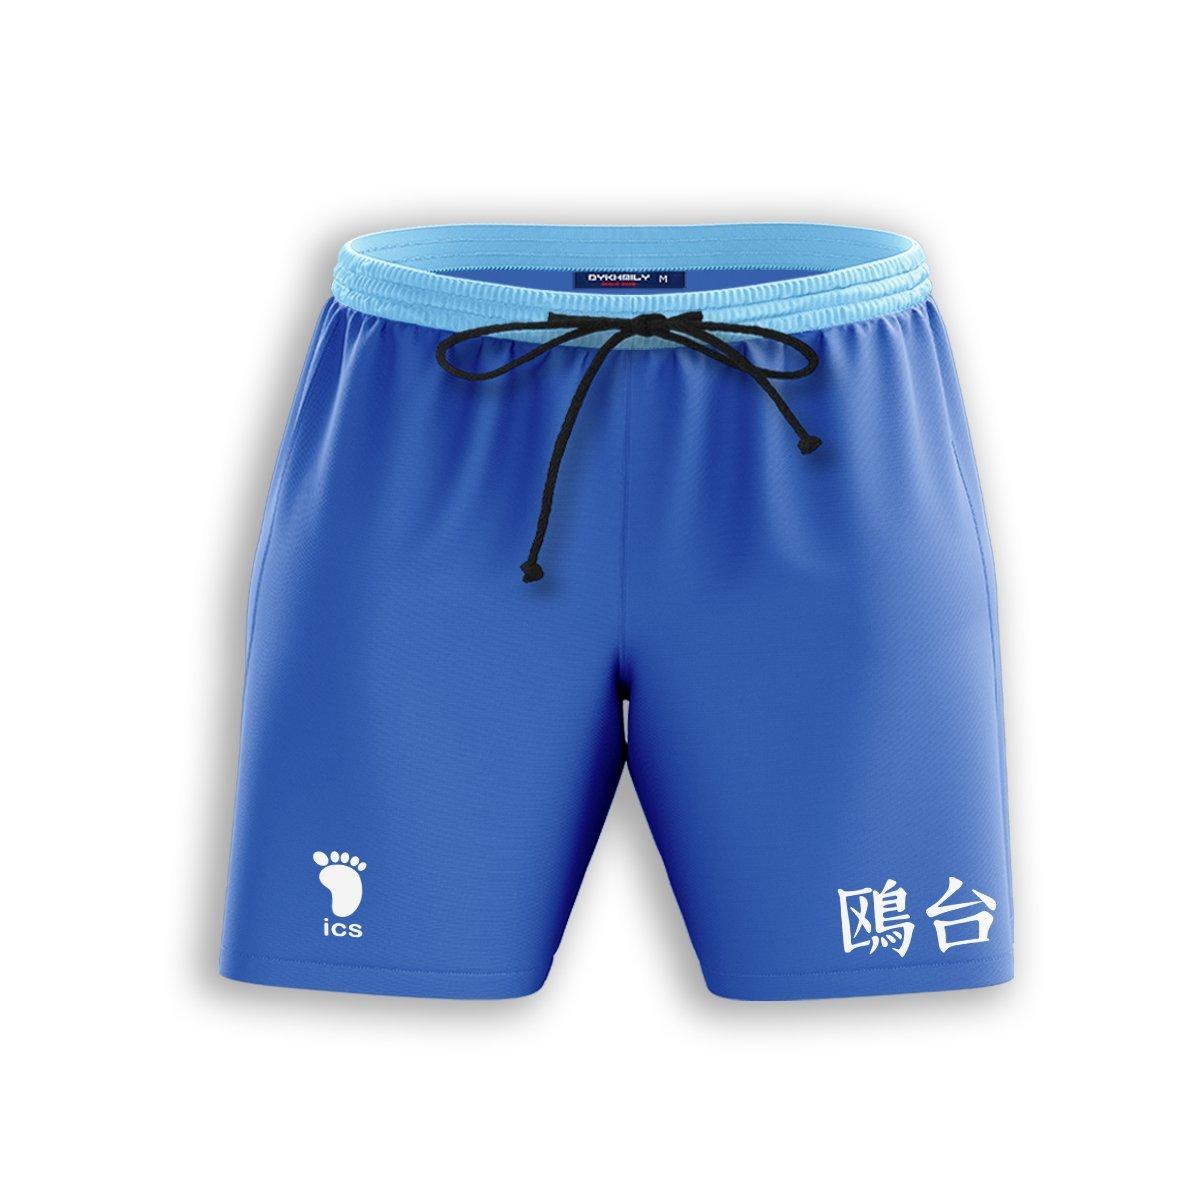 Kamomedai Libero Beach Shorts FDM3107 S Official Anime Swimsuit Merch